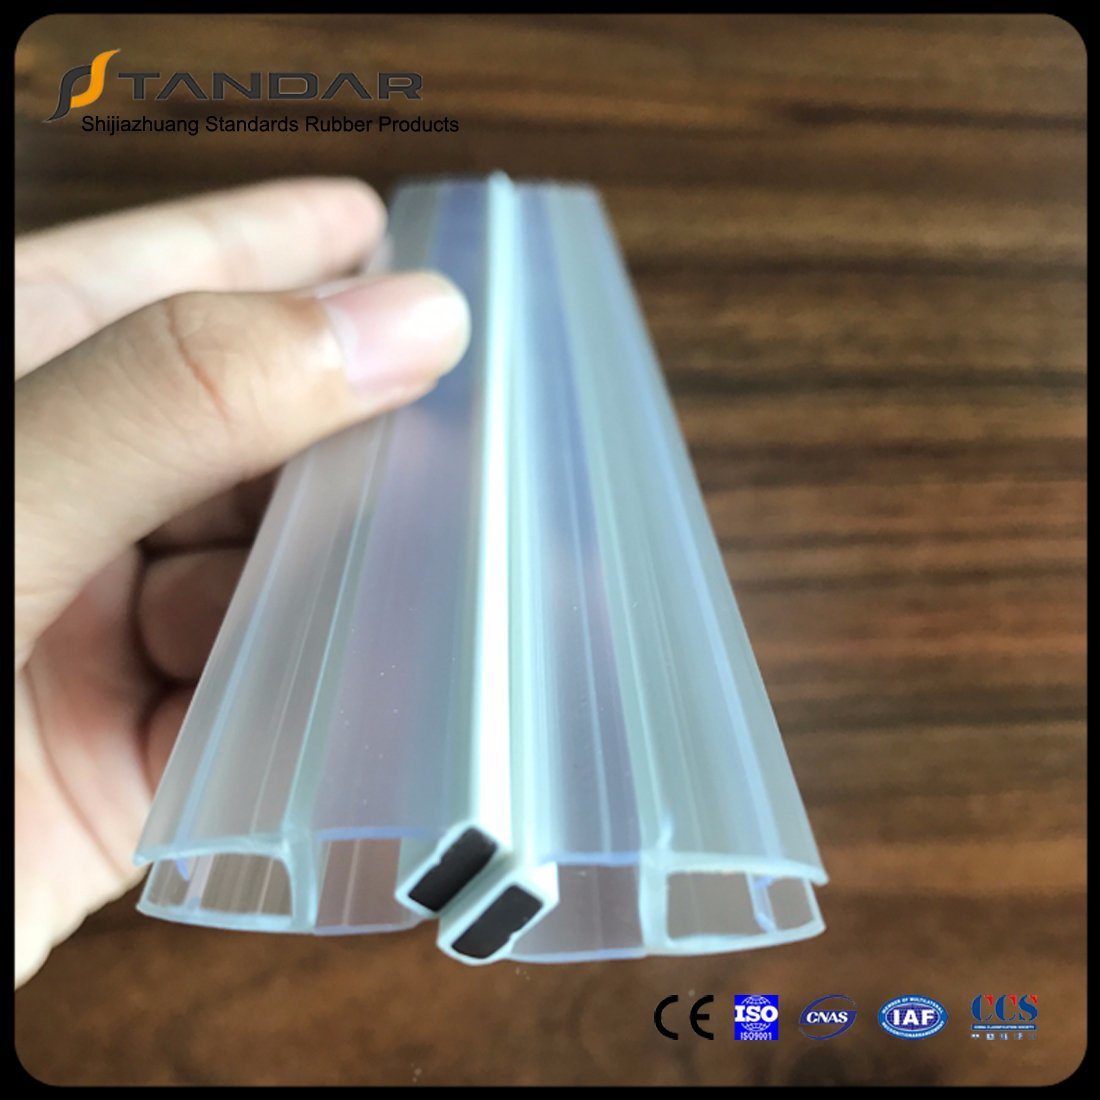 China Pvc Sealing Strip Glass Shower Door Seal Strip China Pvc